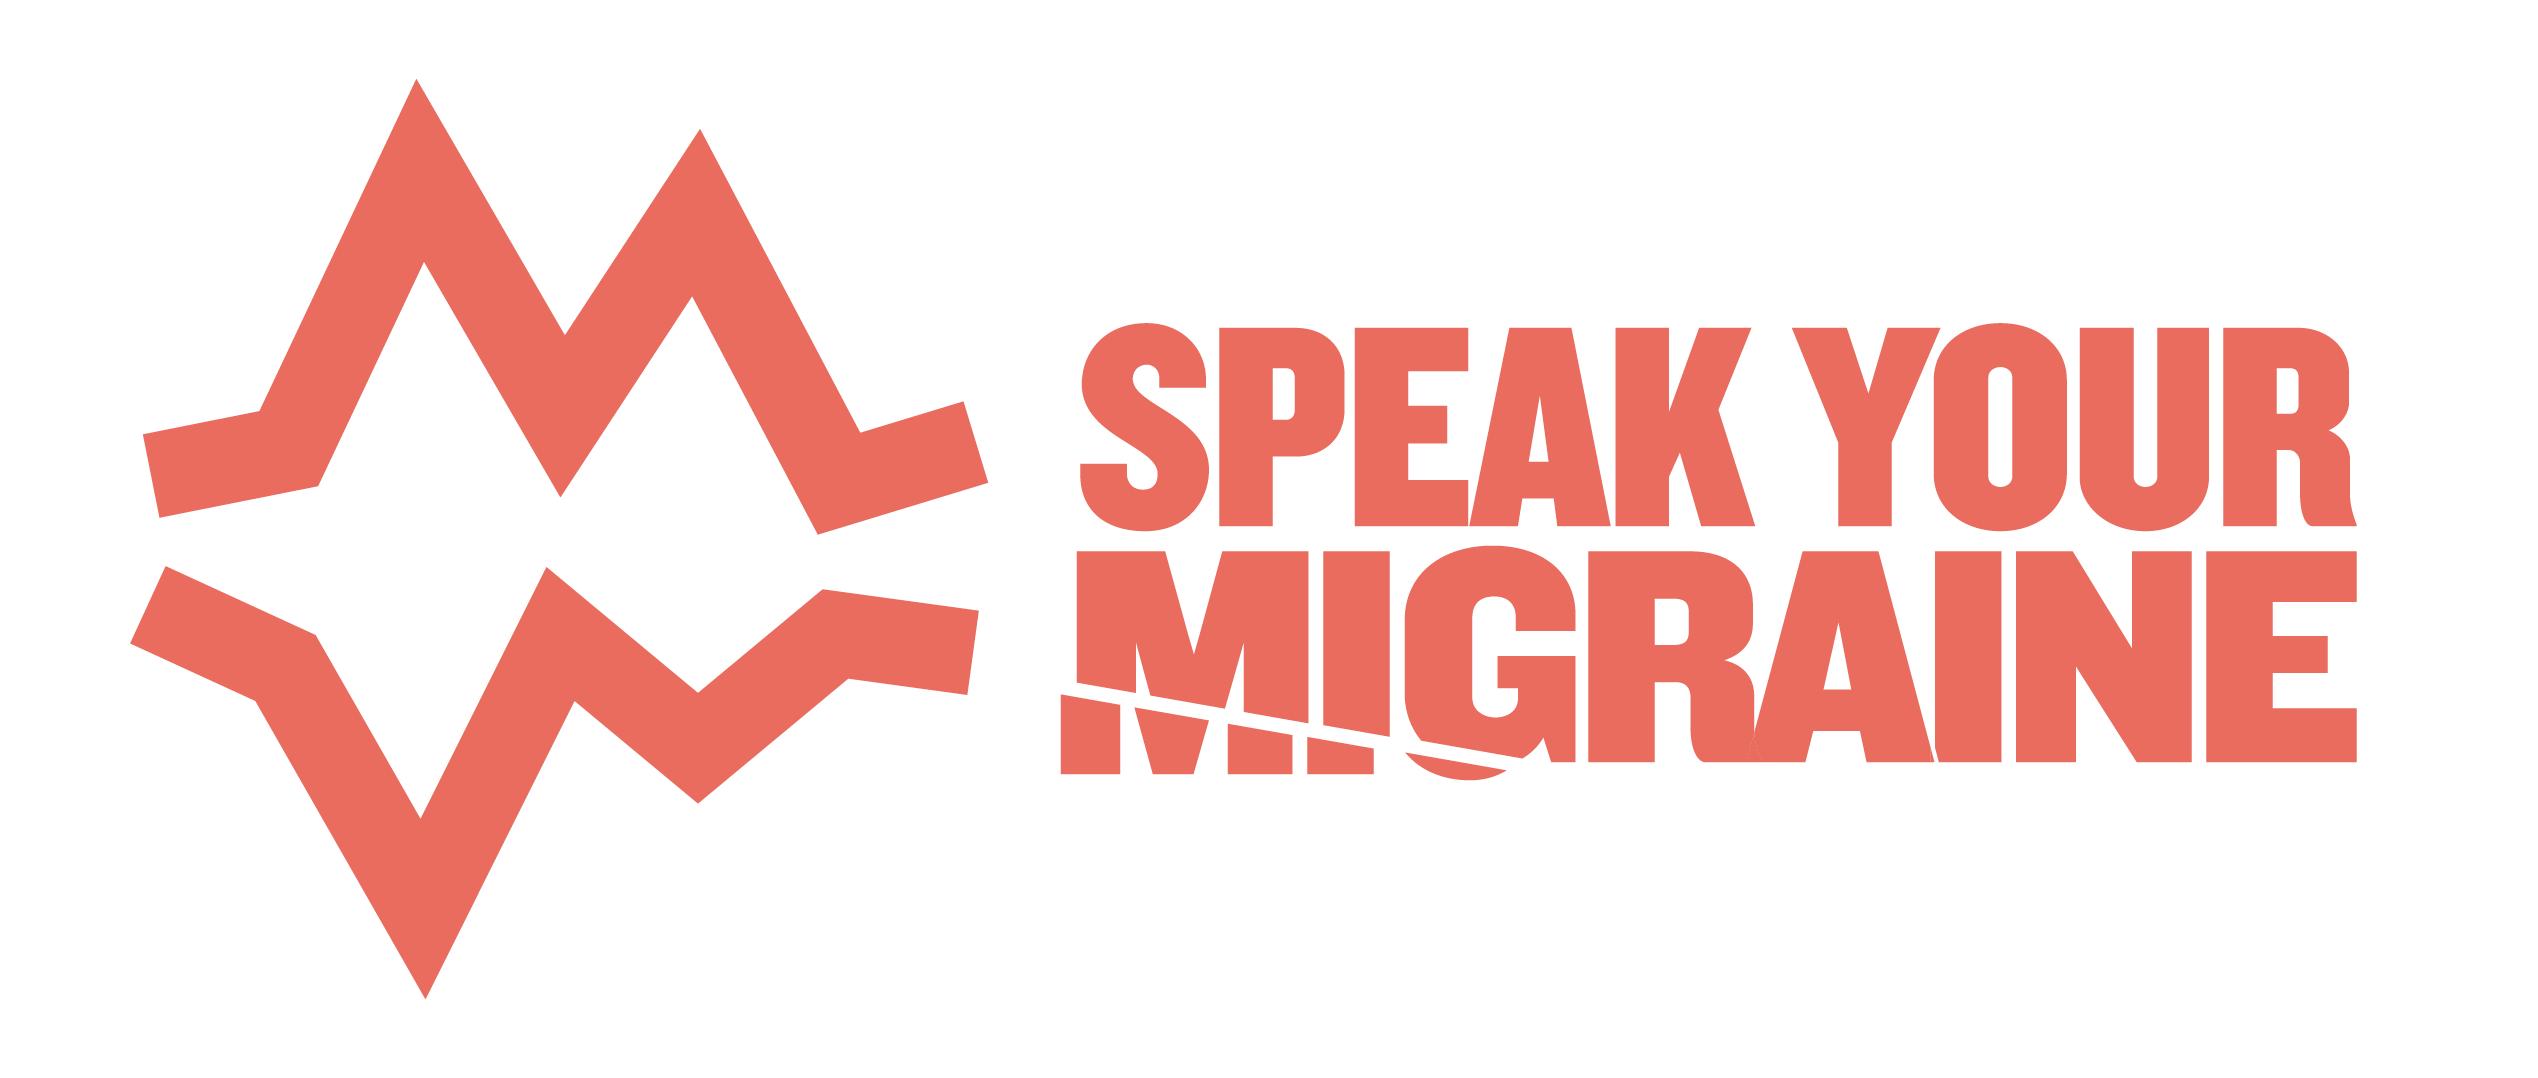 Speak your migraine